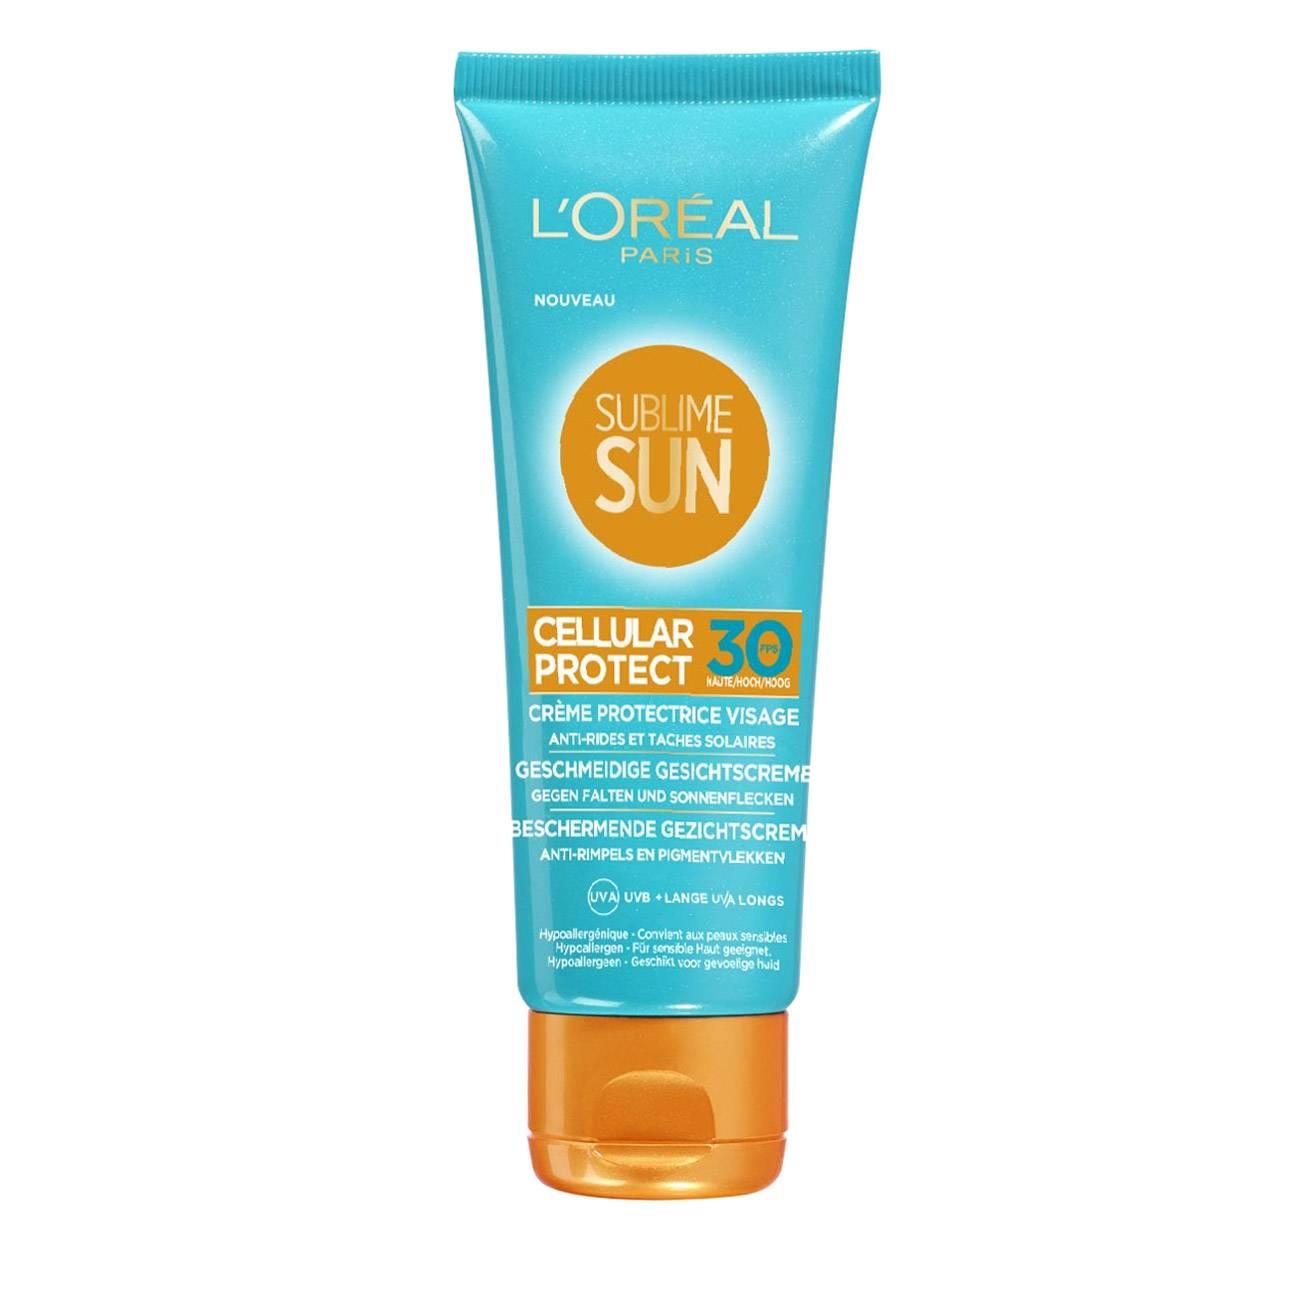 SUBLIME SUN CELLULAR PROTECT FACE CREAM 75ml